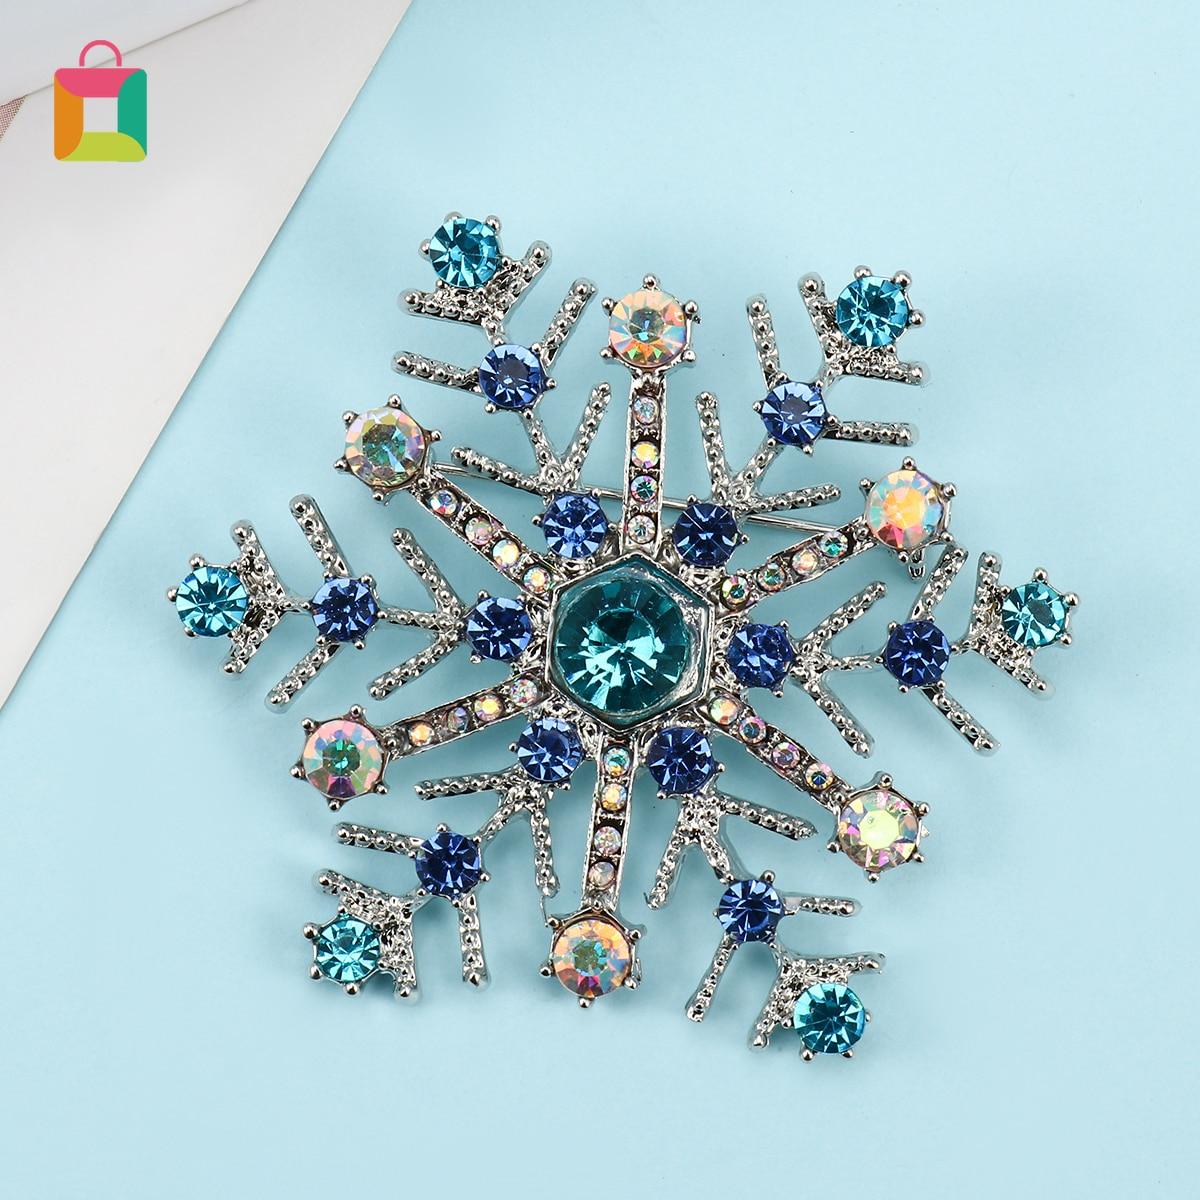 Dames Sneeuwvlok Glanzende Kleur Strass Broche Sieraden Compound Haar Bronze Crystal Kerst Broche Gift Ornament Glittery